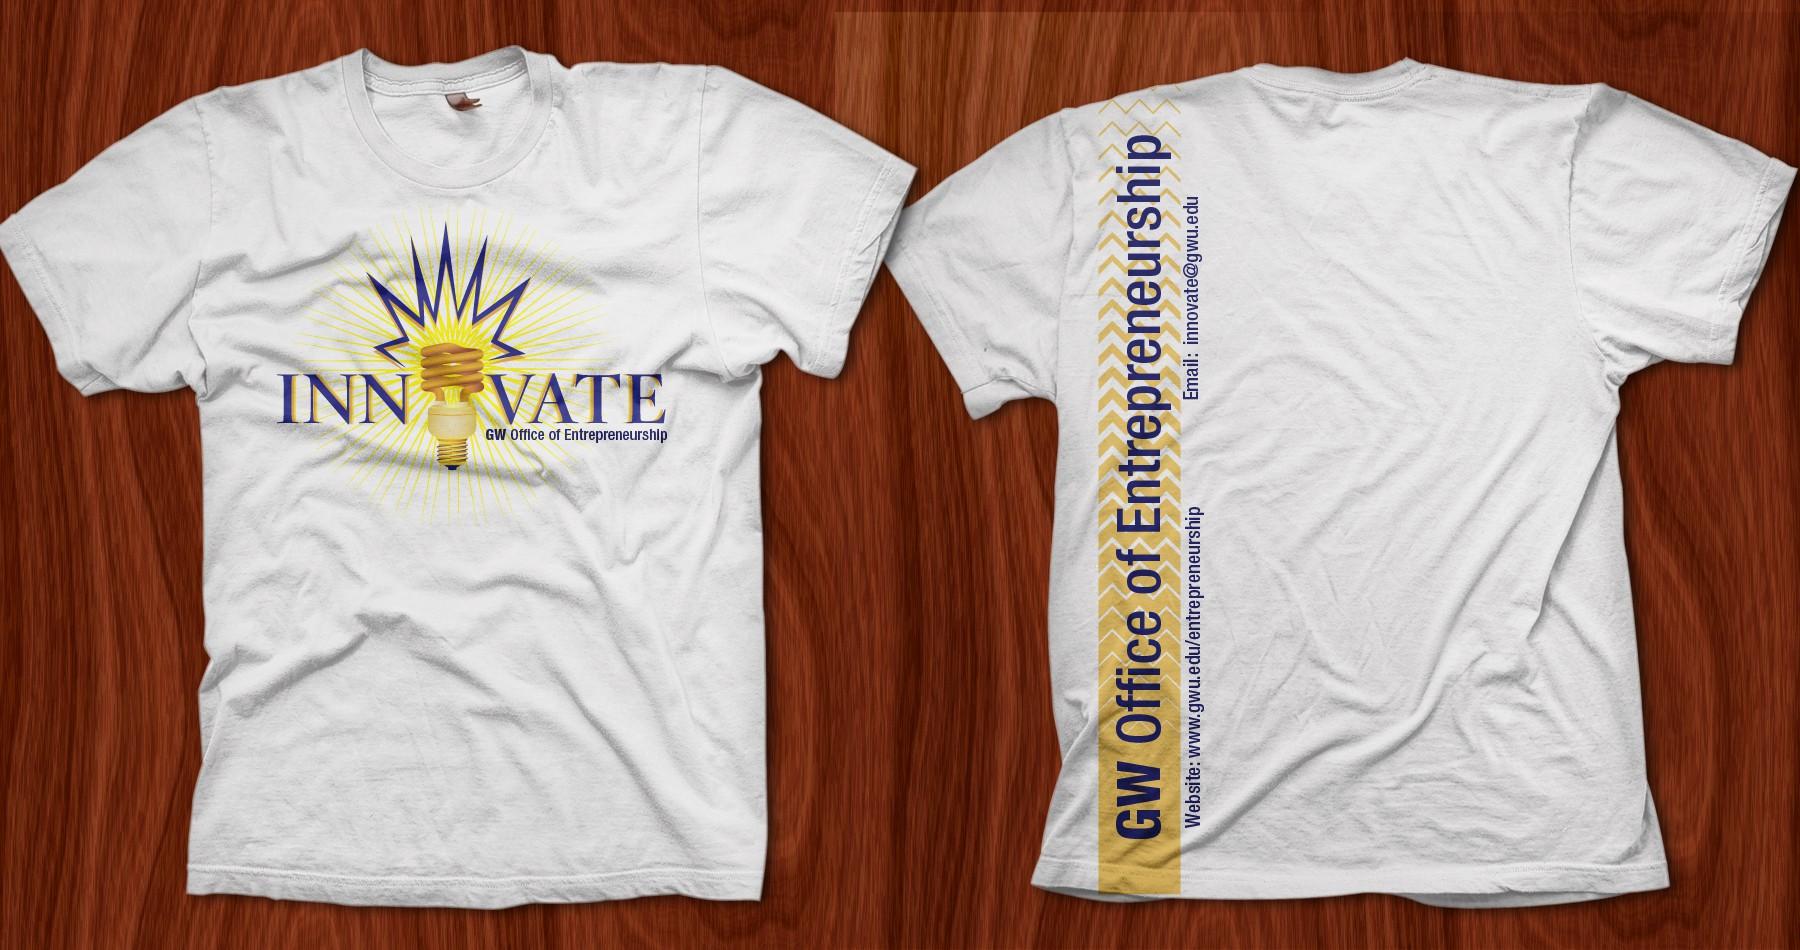 George Washington University Office of Entrepreneurship T-Shirt Design